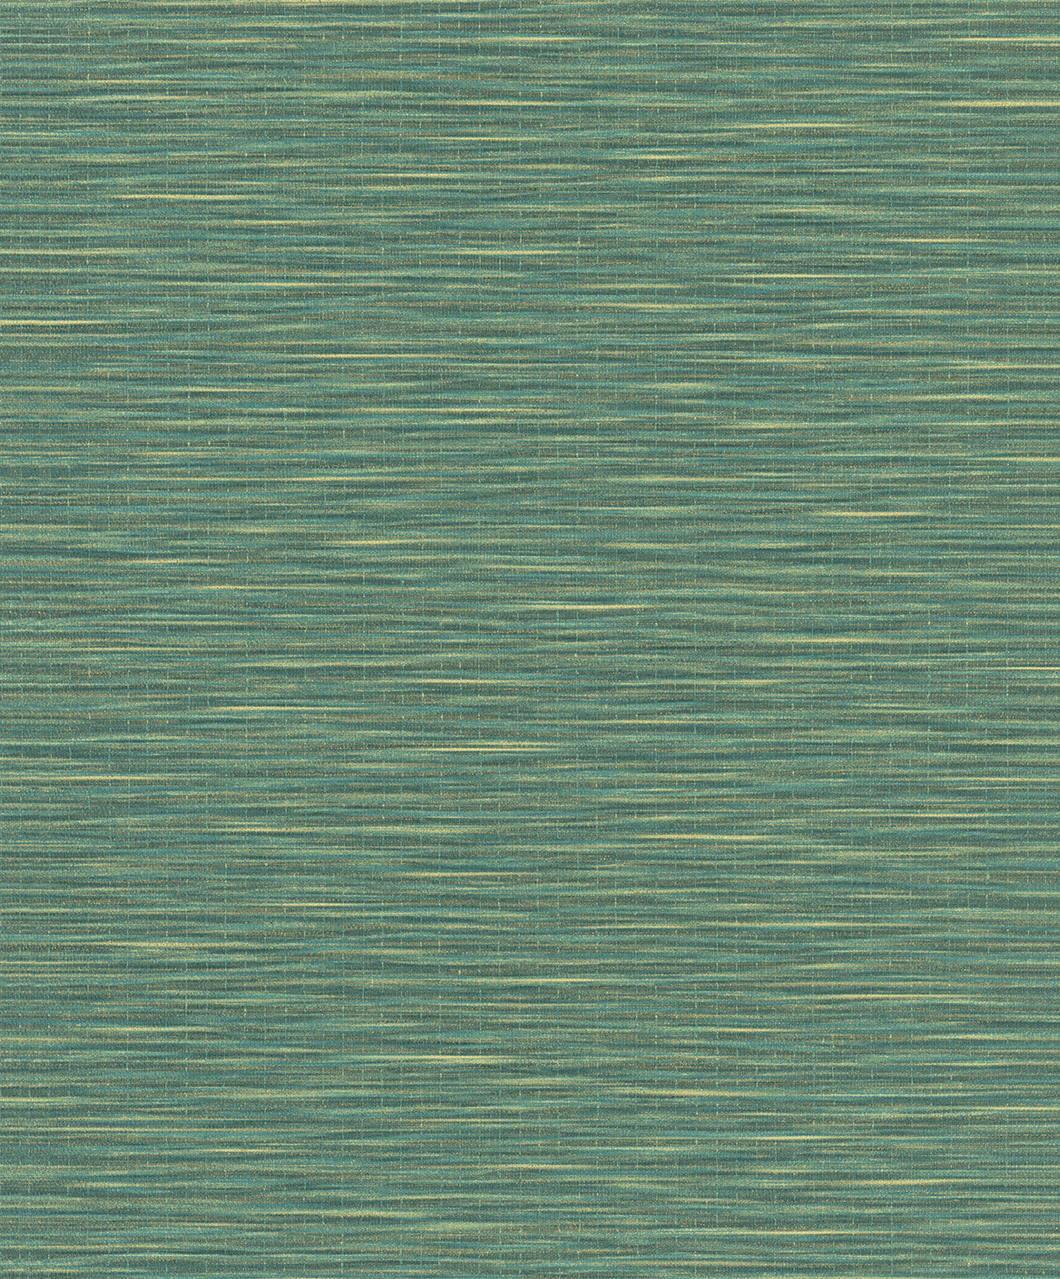 33017_Botanica